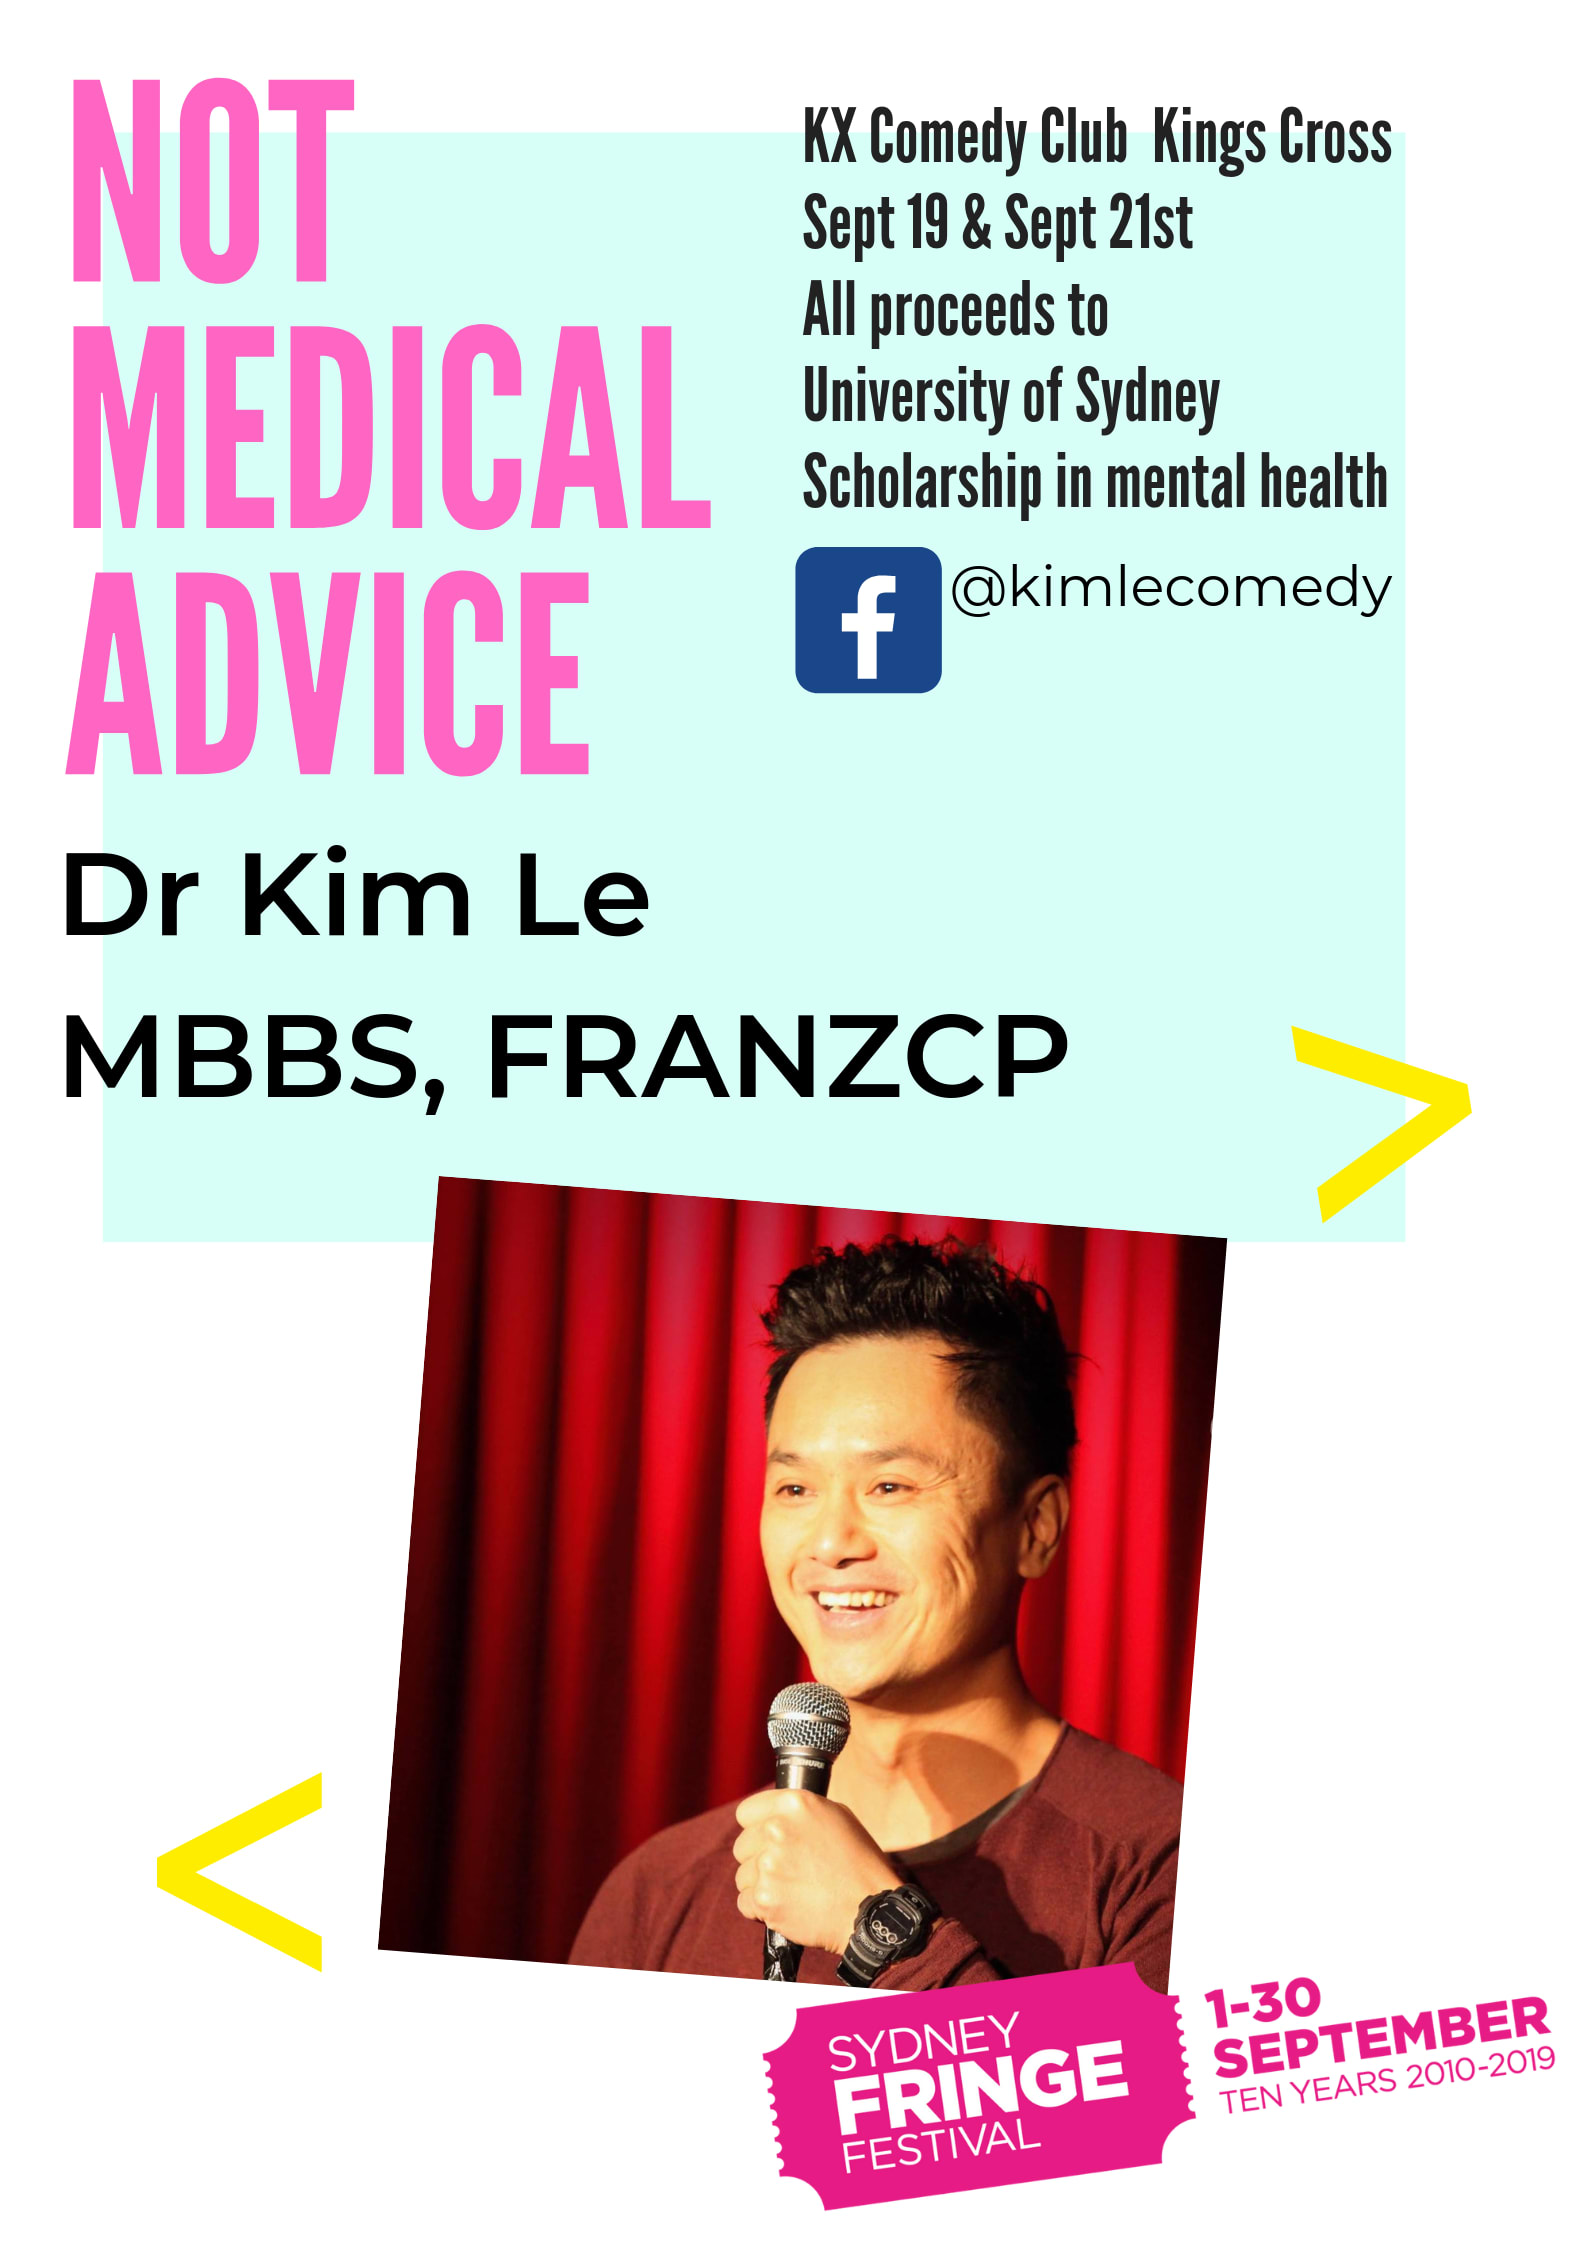 The University of Sydney | Andrew Tu Scholarship in Pharmacy